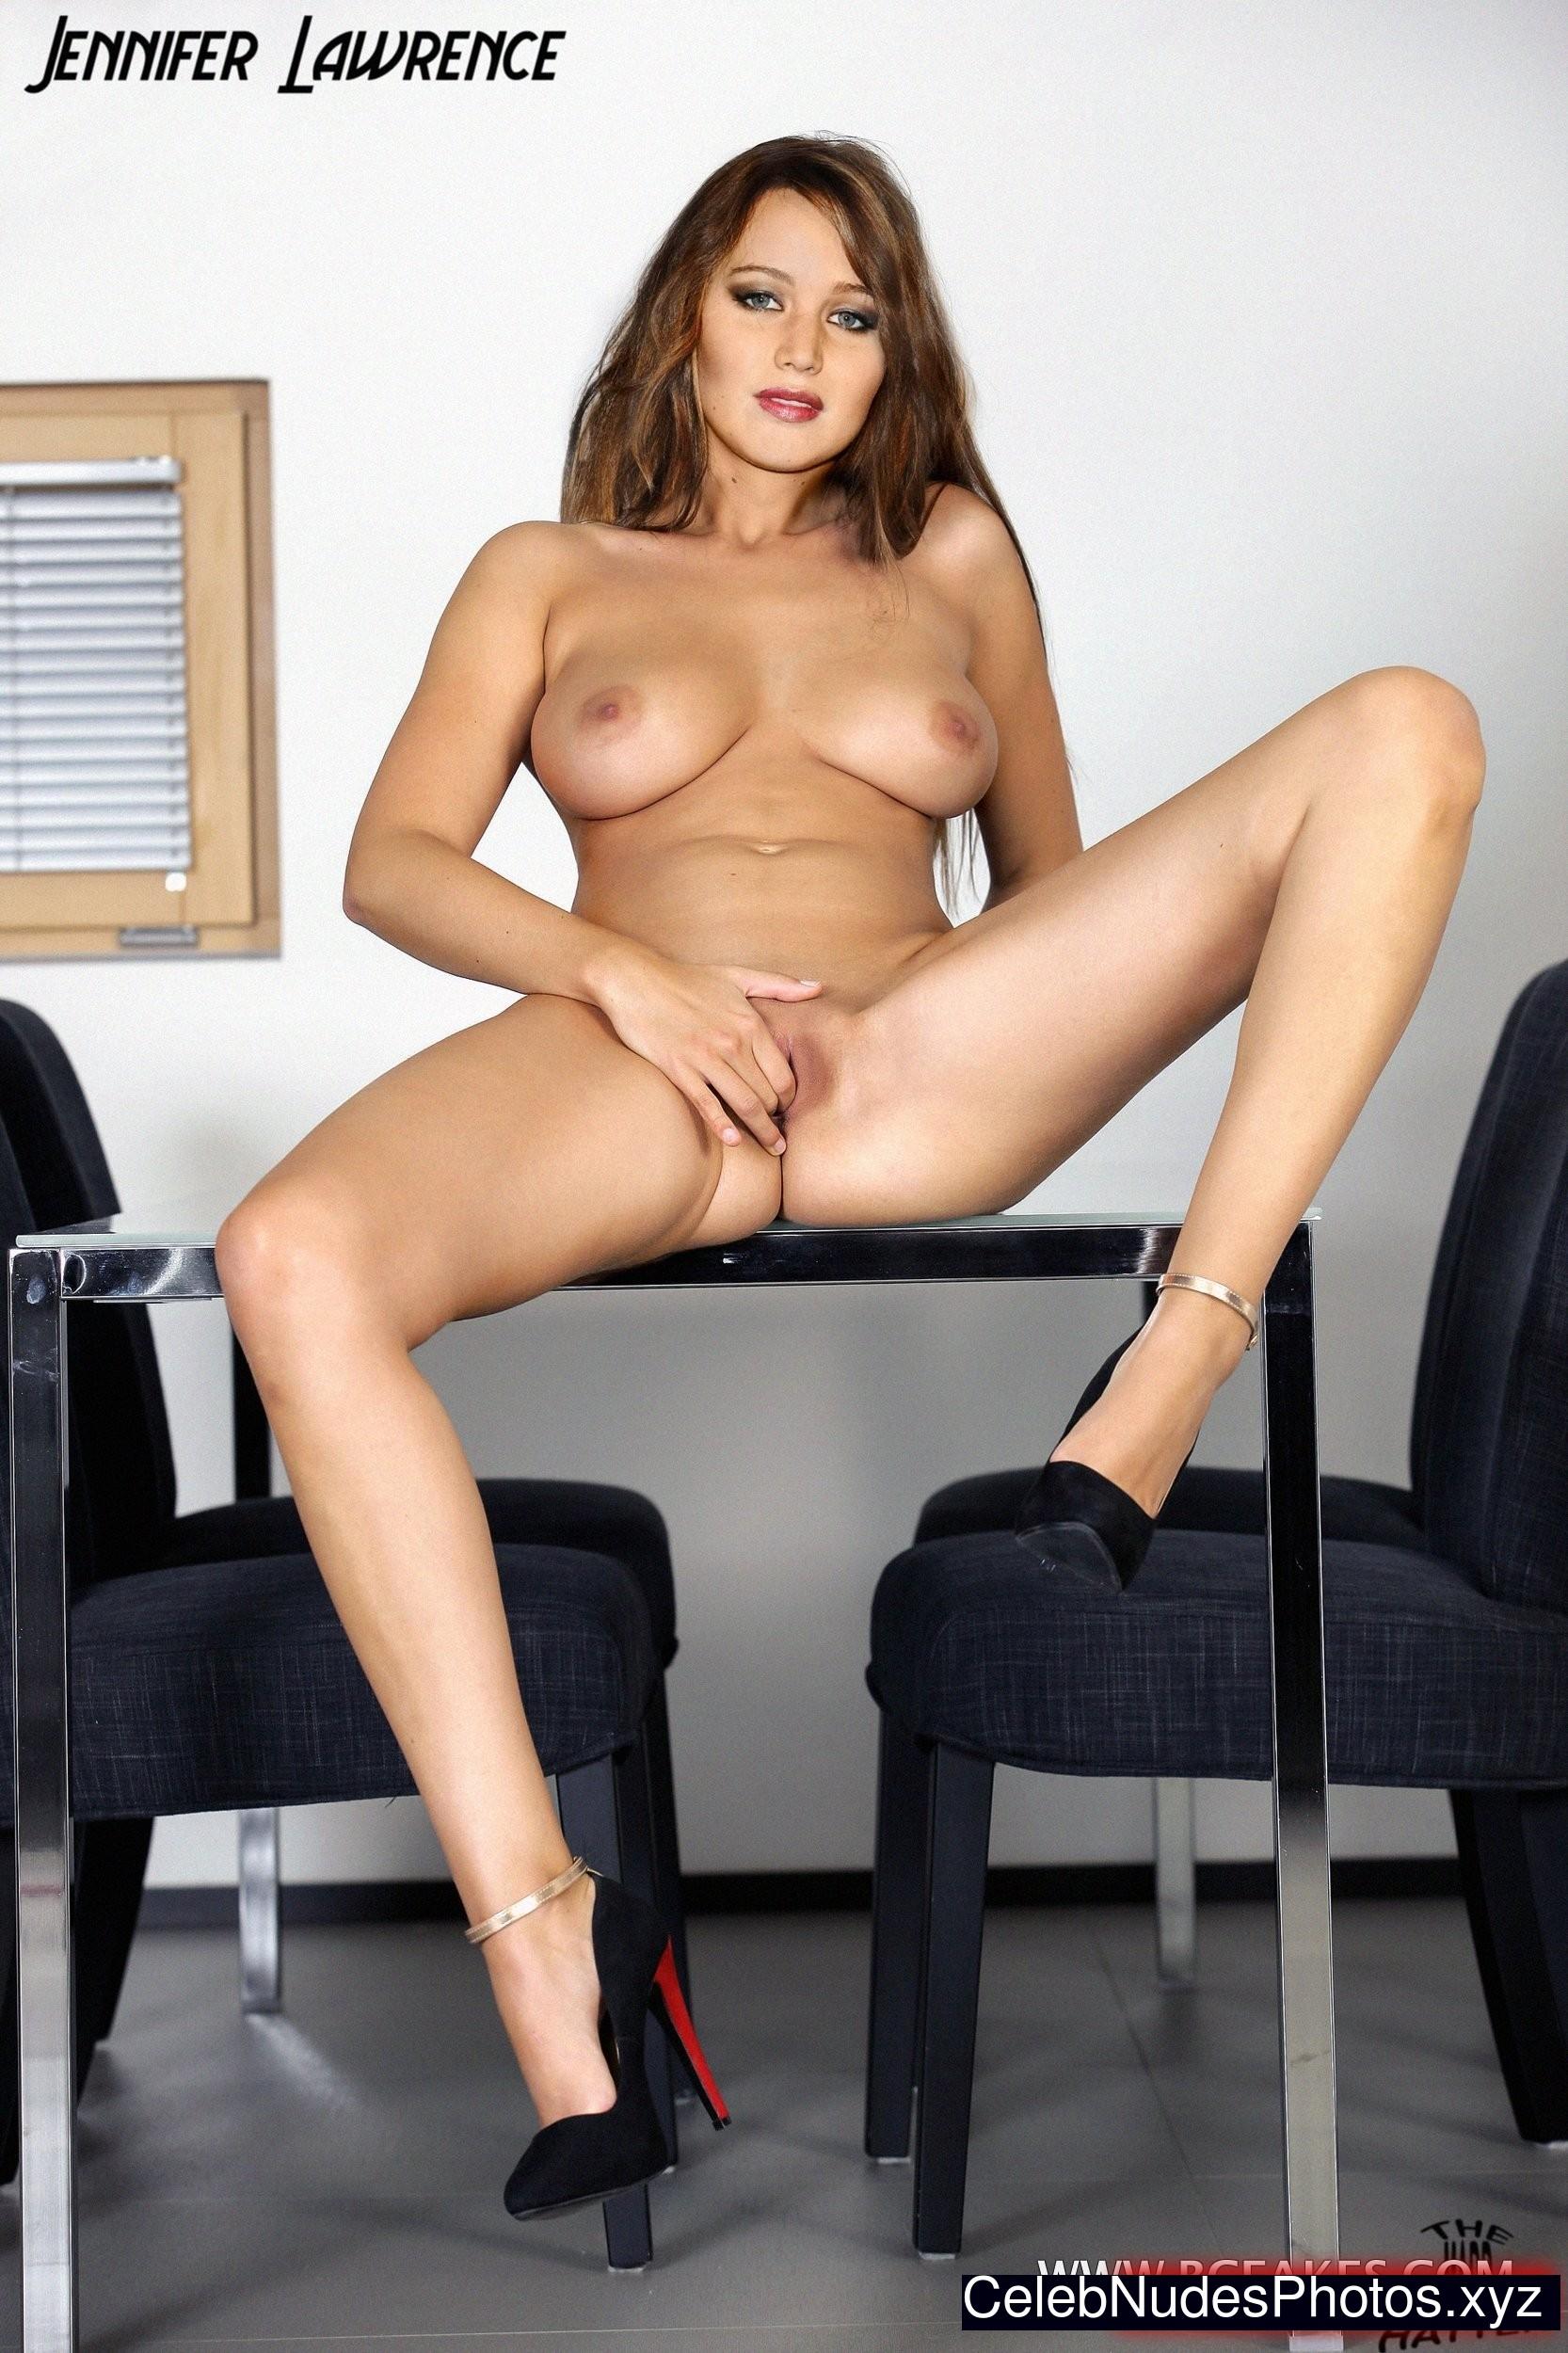 Jennifer Lawrence Nude Celeb Pic sexy 25